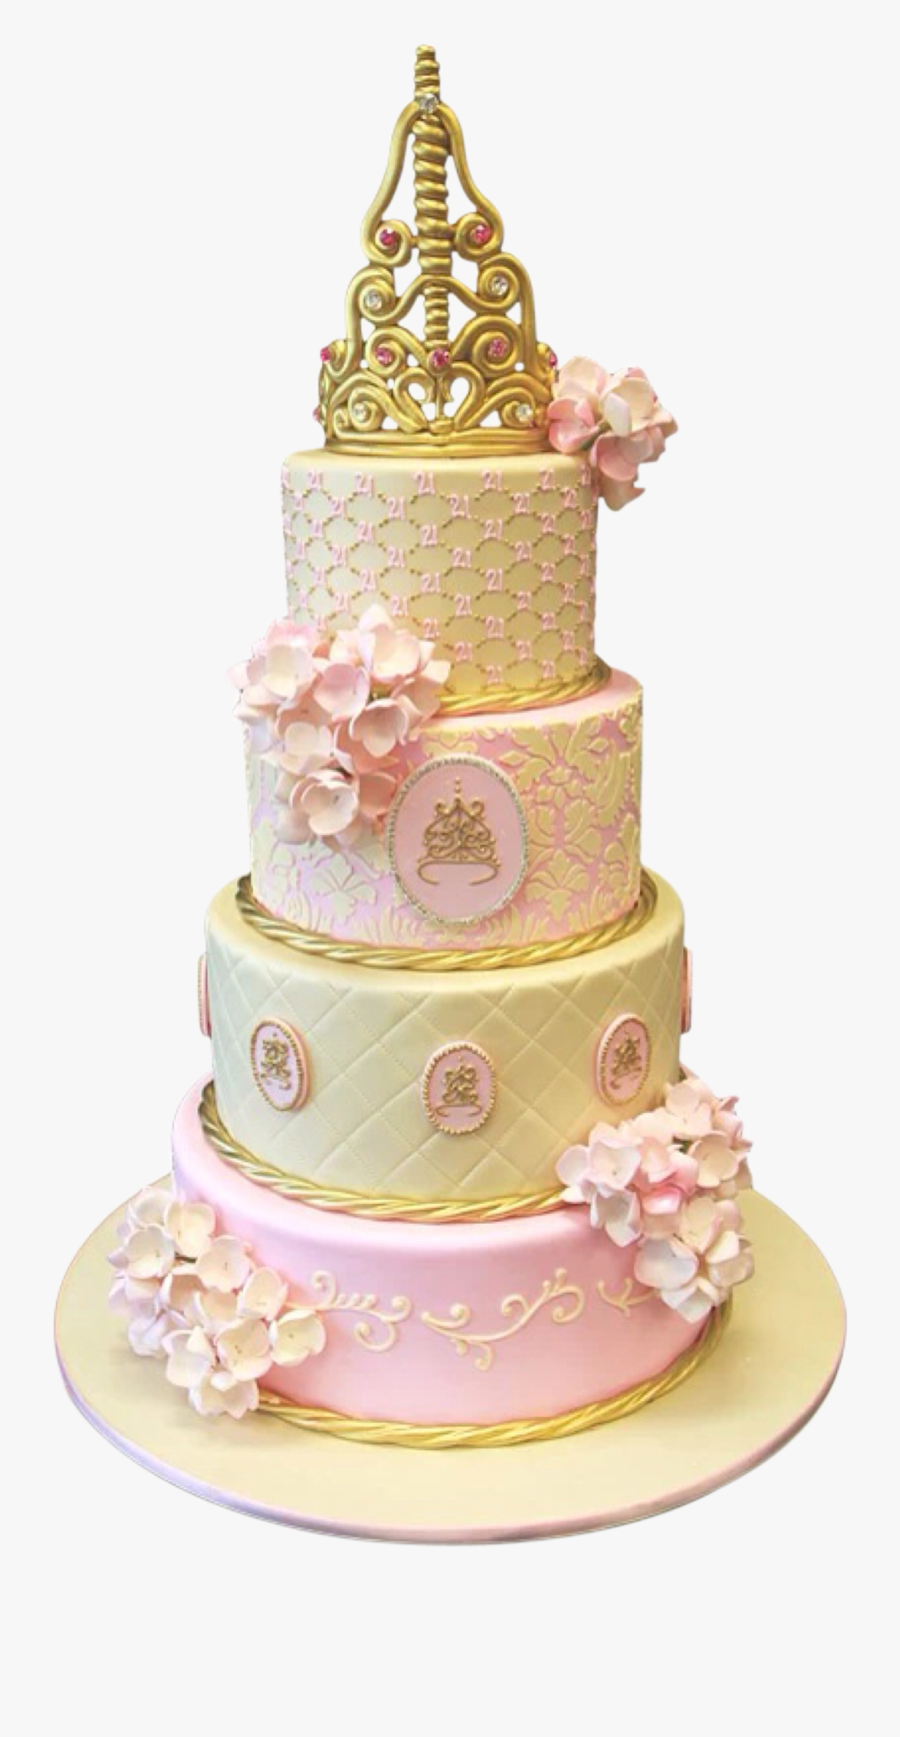 Transparent Wedding Cake Clipart Png - 21st Birthday Cakes Princess, Transparent Clipart